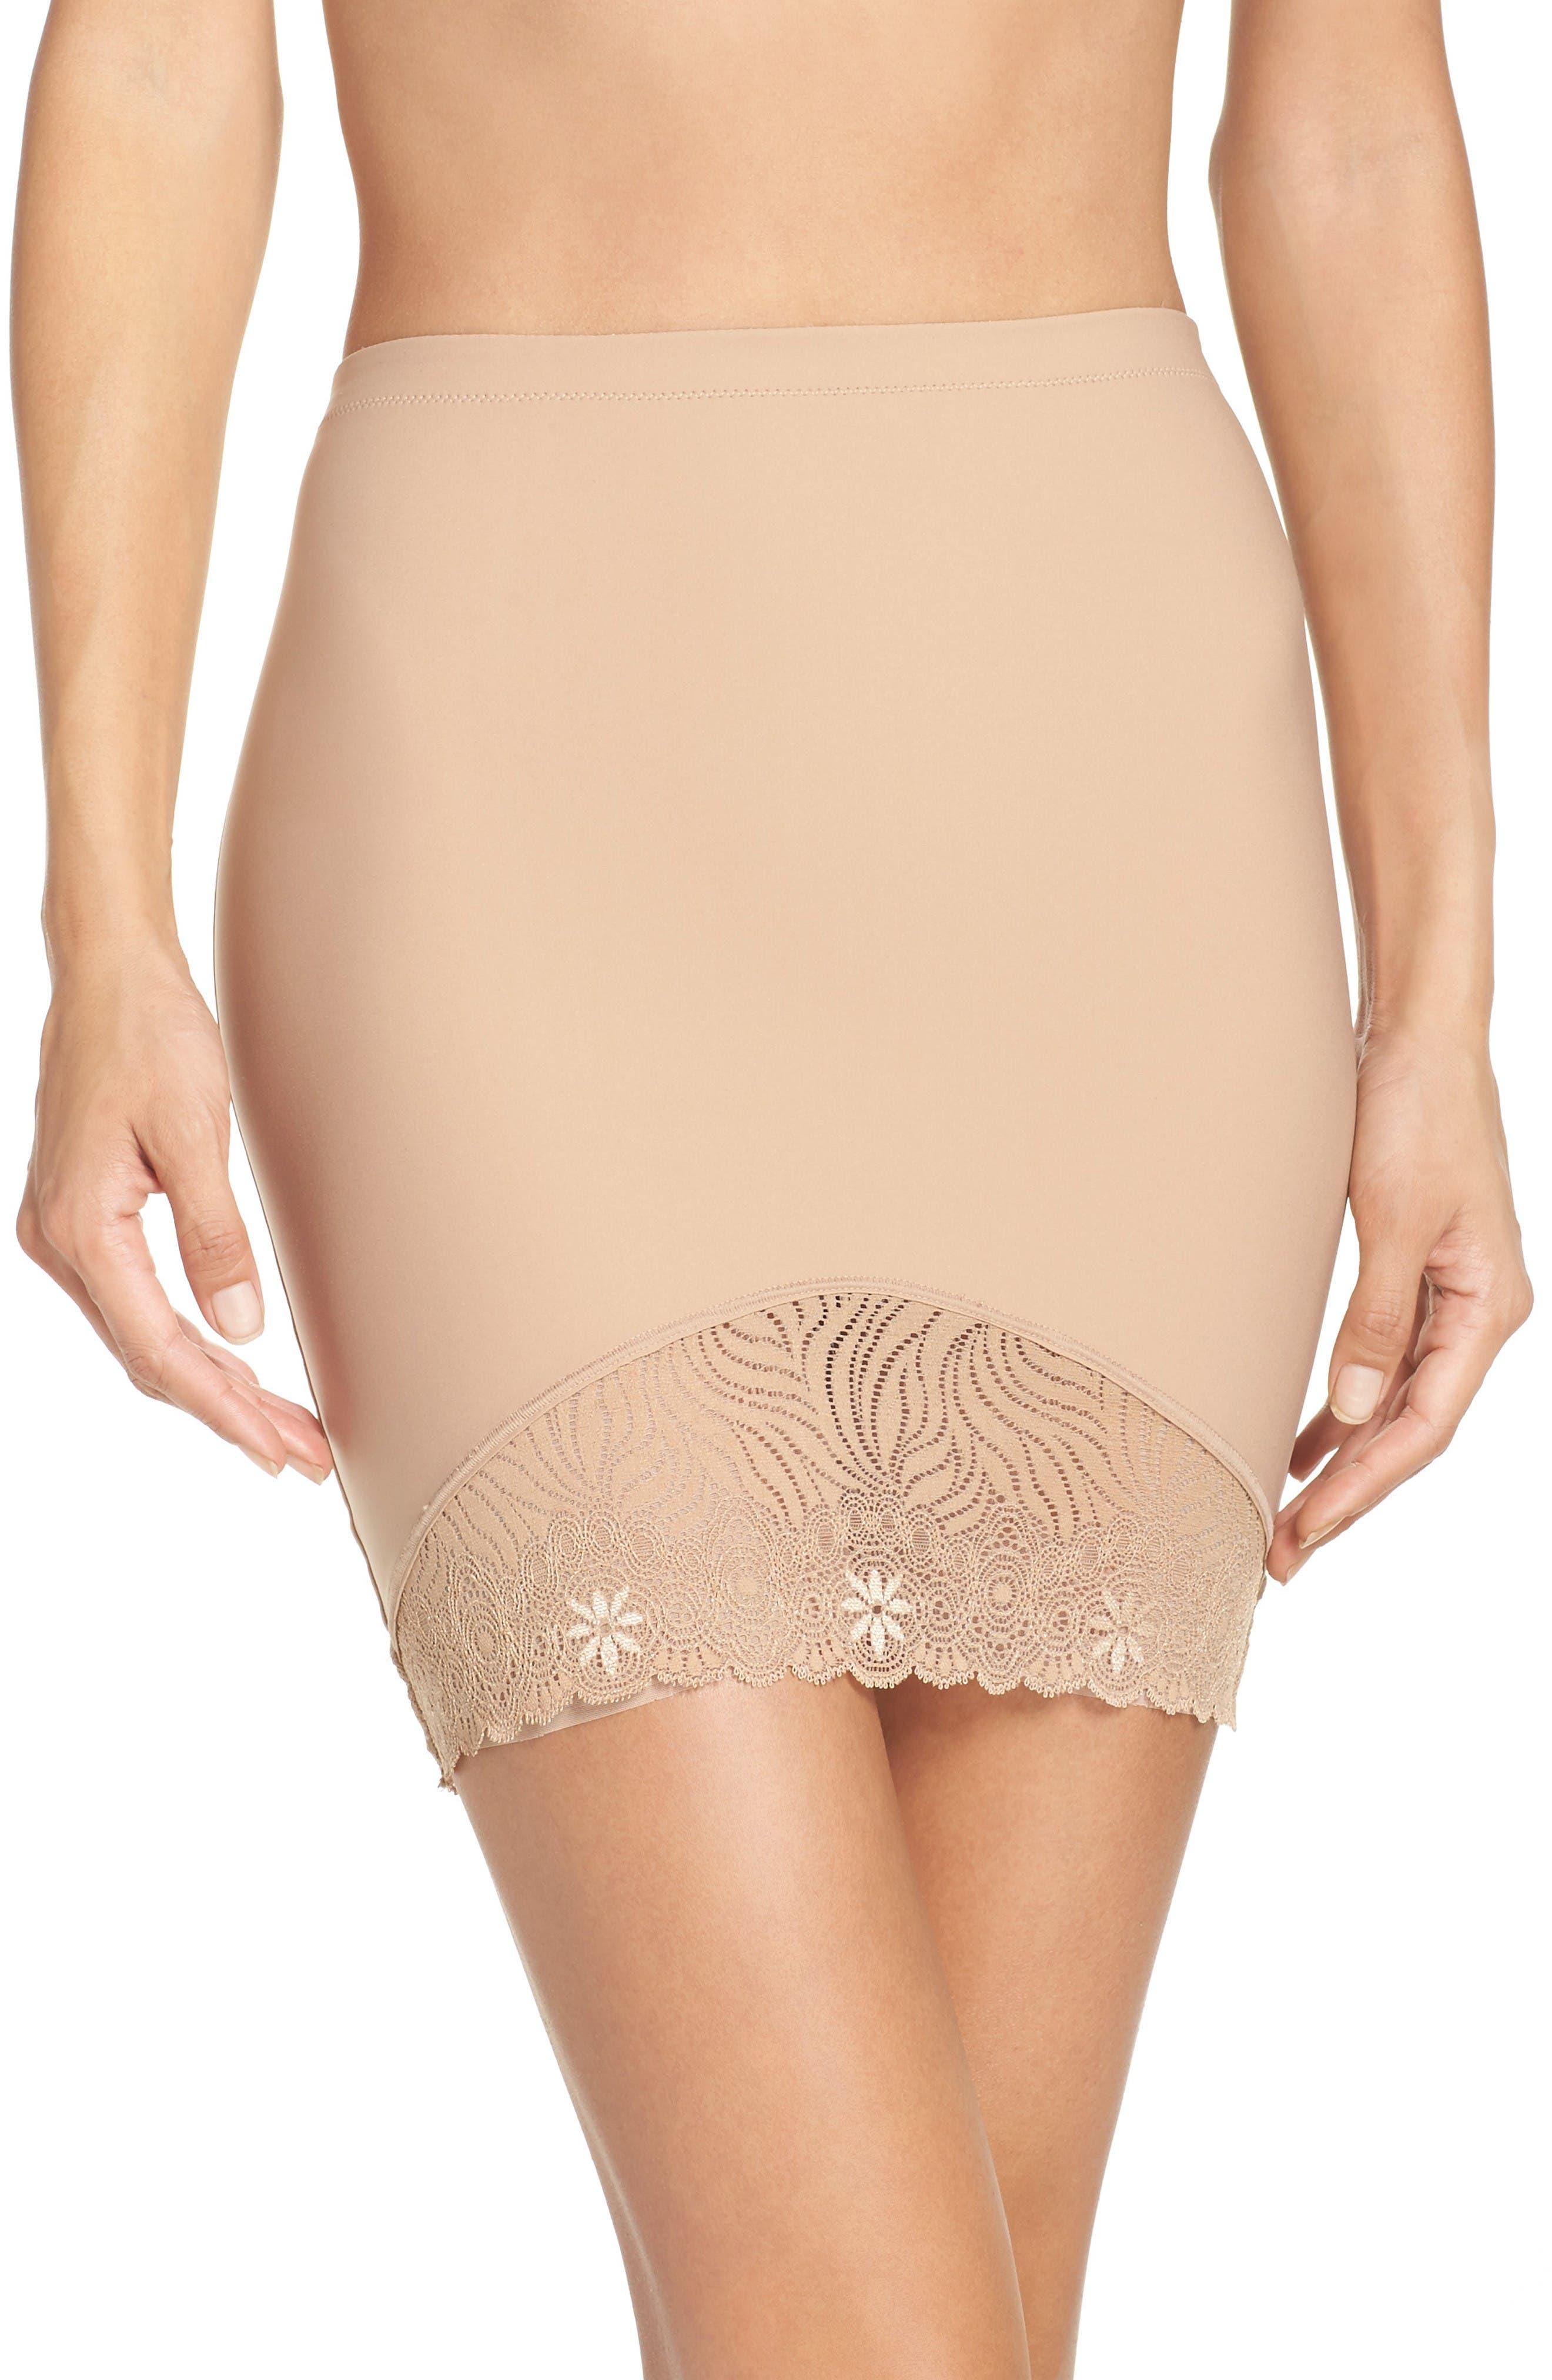 Simone Perele Top Model High Waist Skirt Shaper